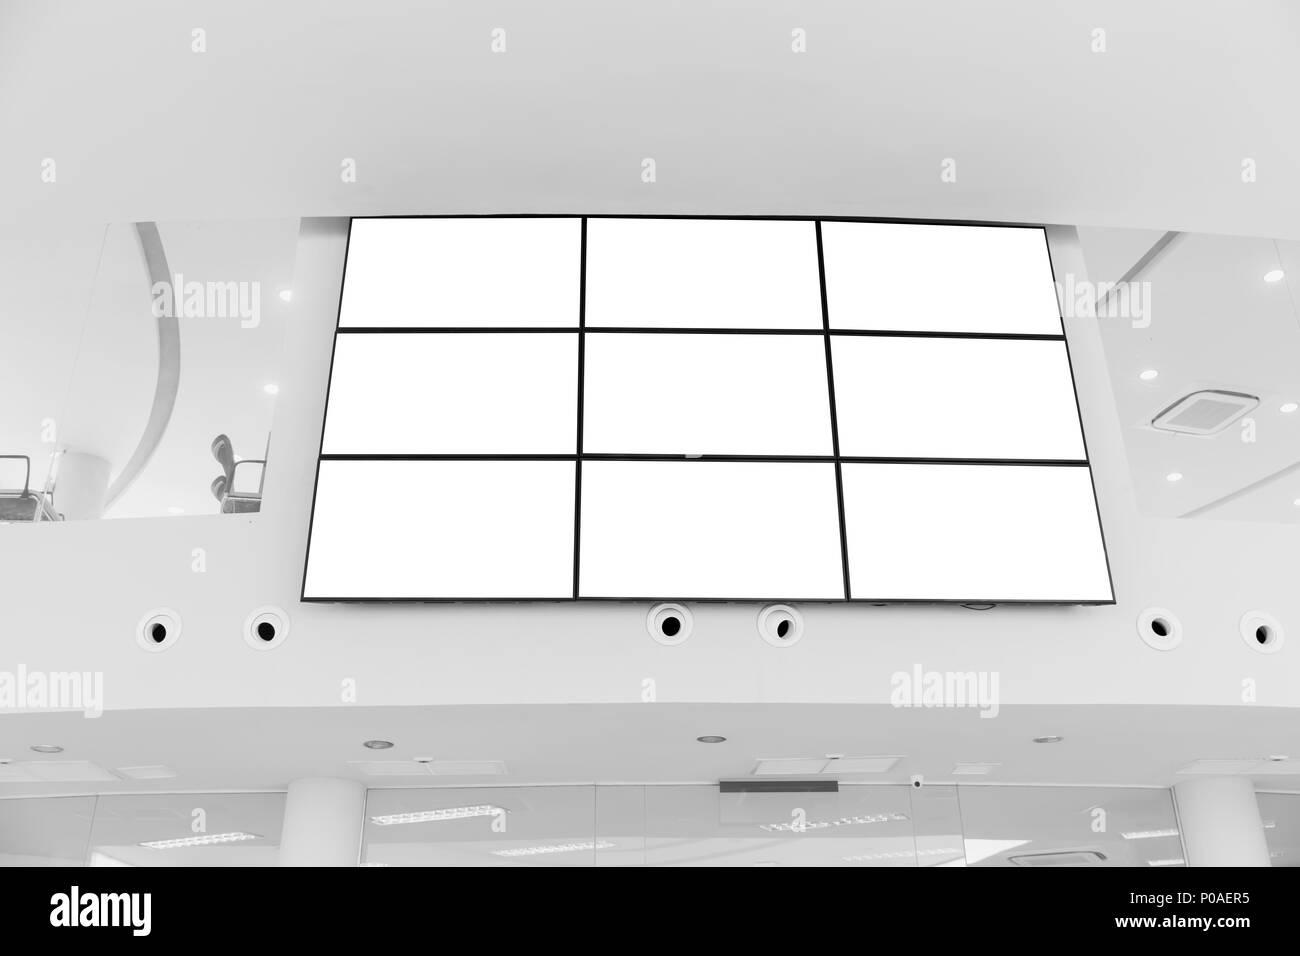 Video wall LED screen array billboard setup installation indoor office hall - Stock Image